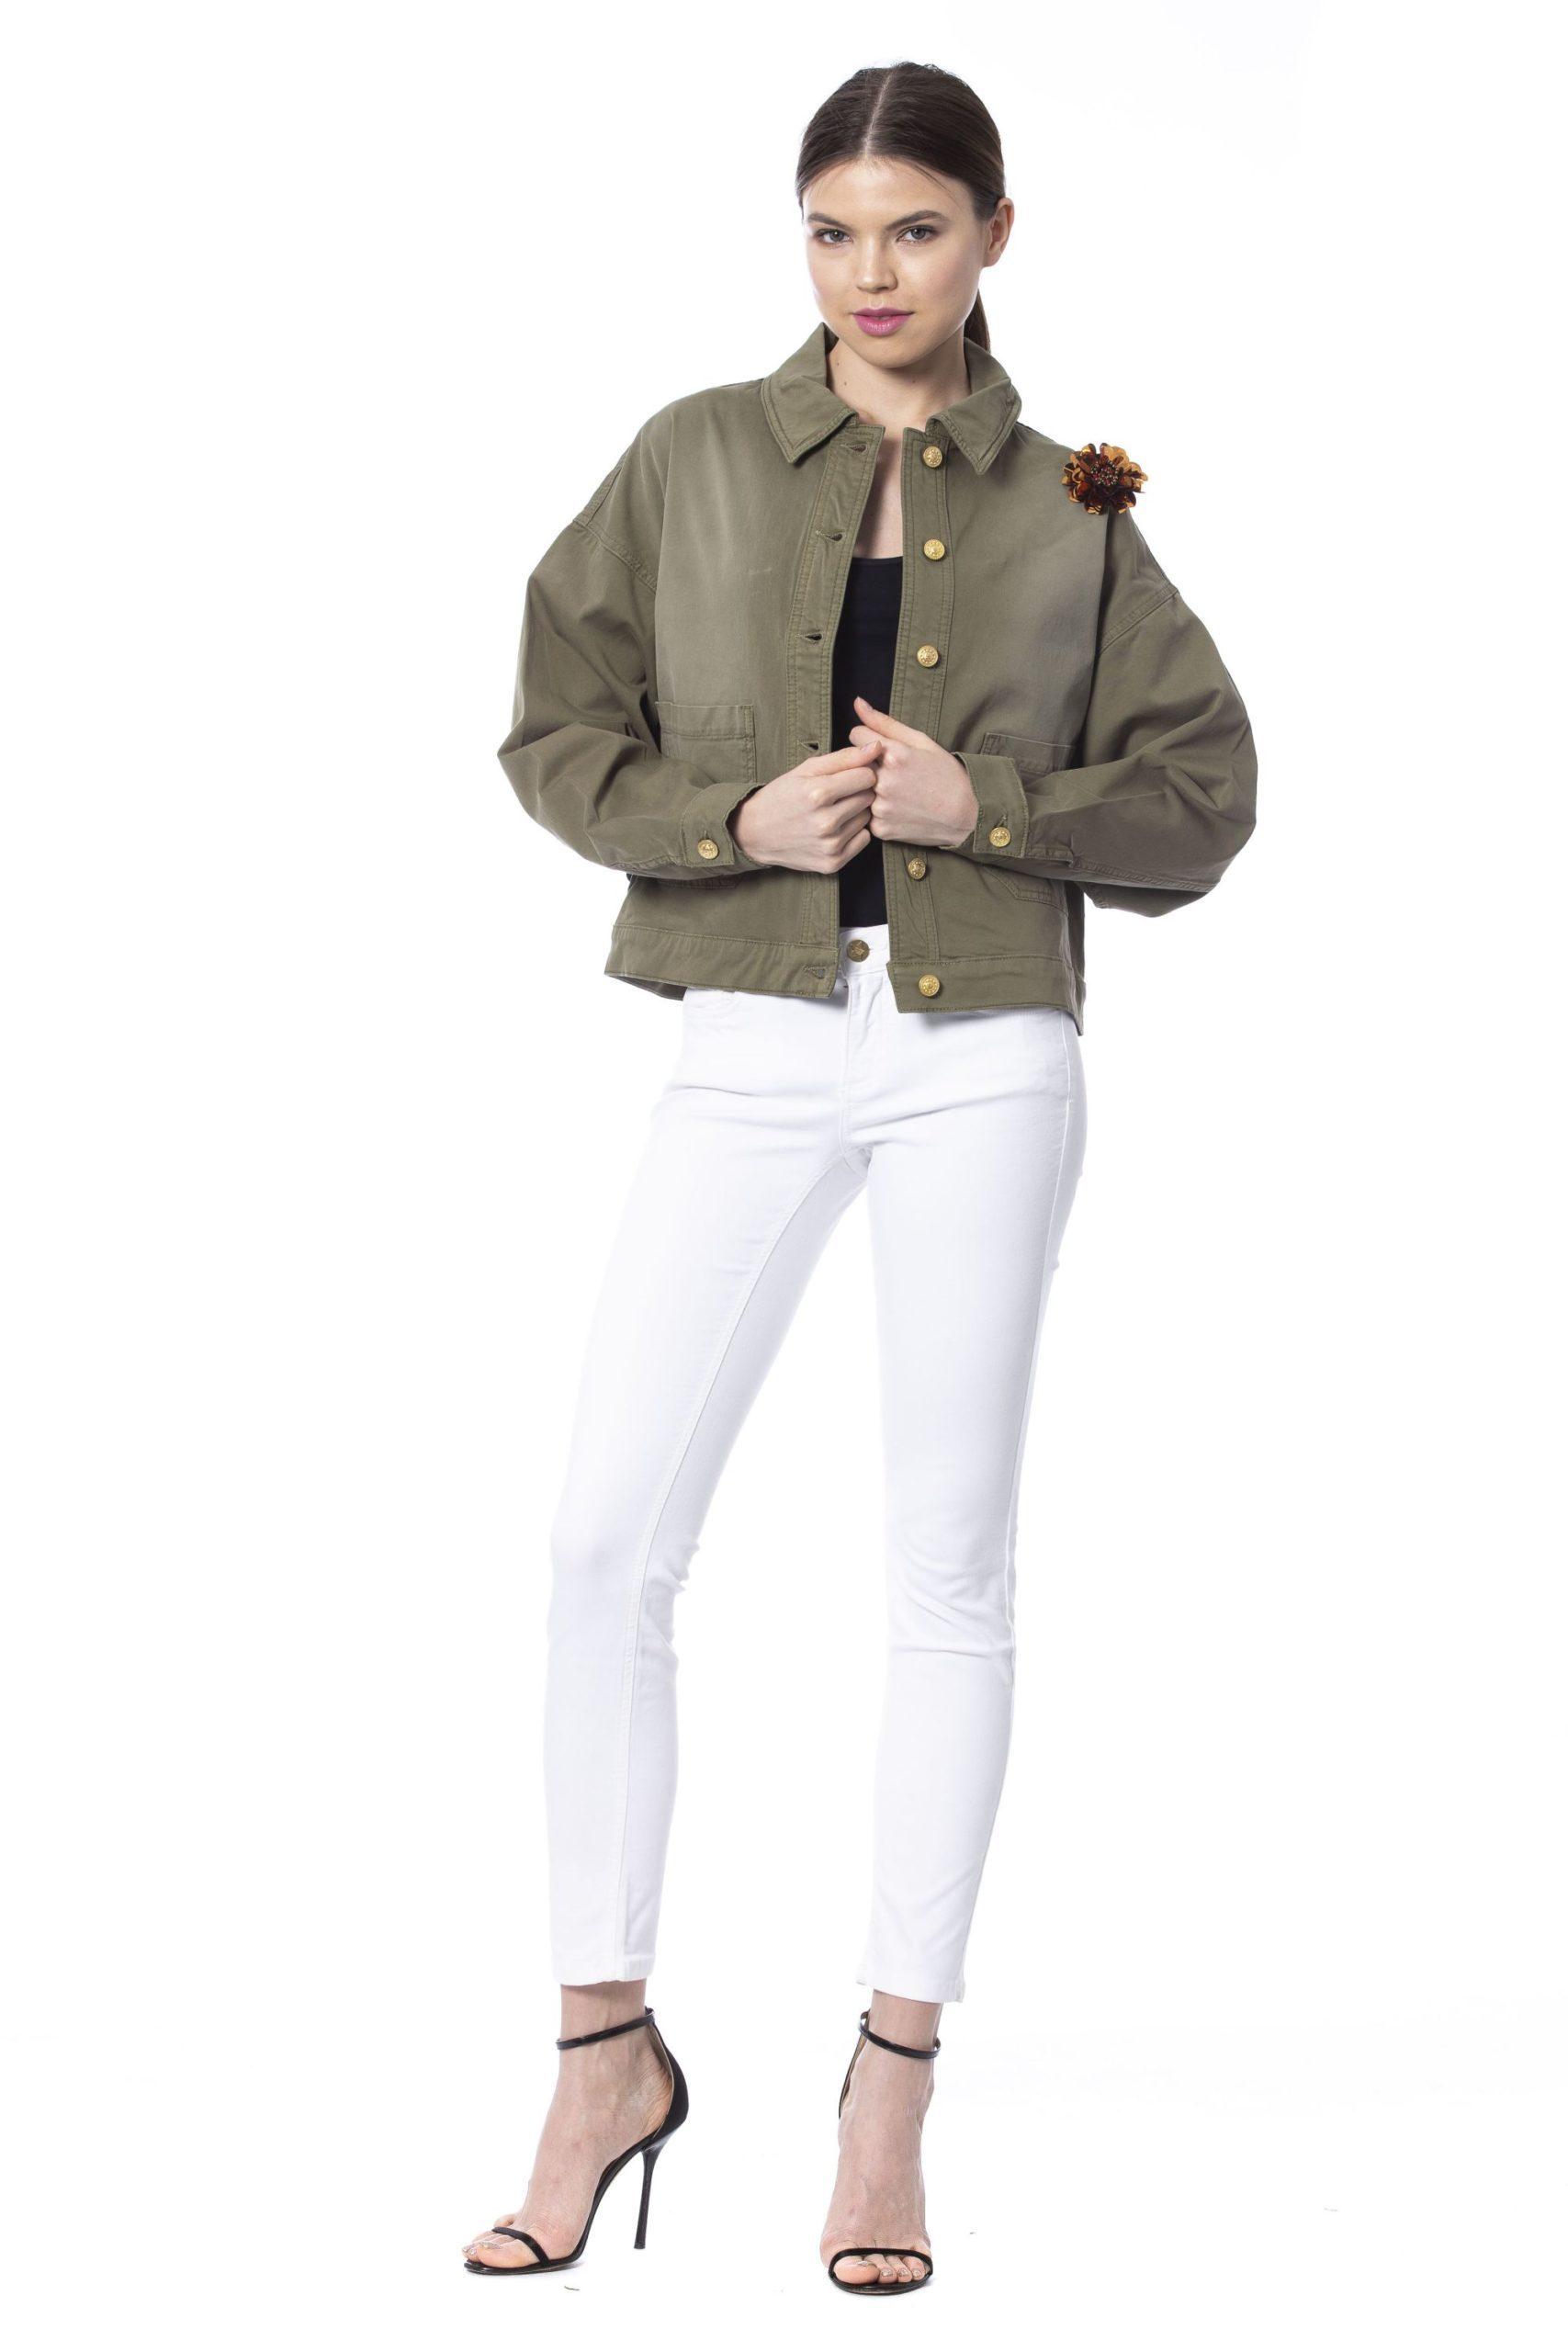 Silvian Heach Women's Jacket Army SI1263926 - XS